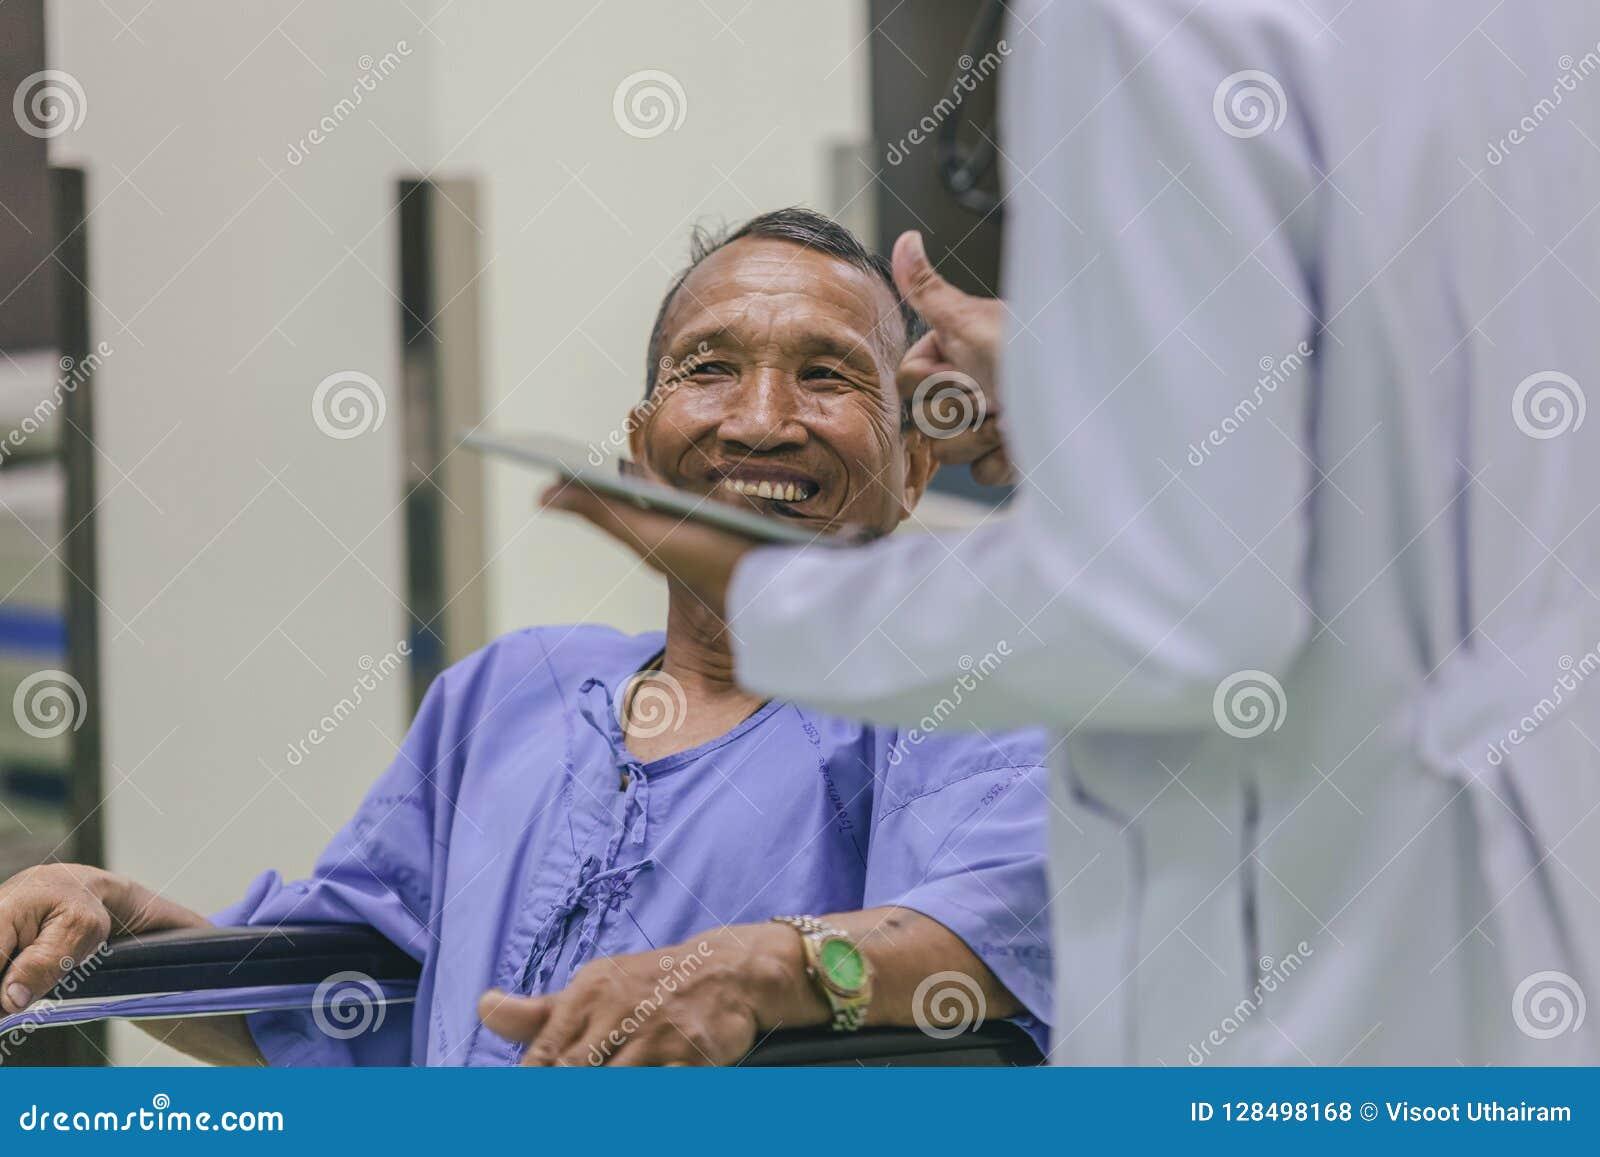 Asiatisk patient i rullstolsammanträde i sjukhus med asiatisk docto